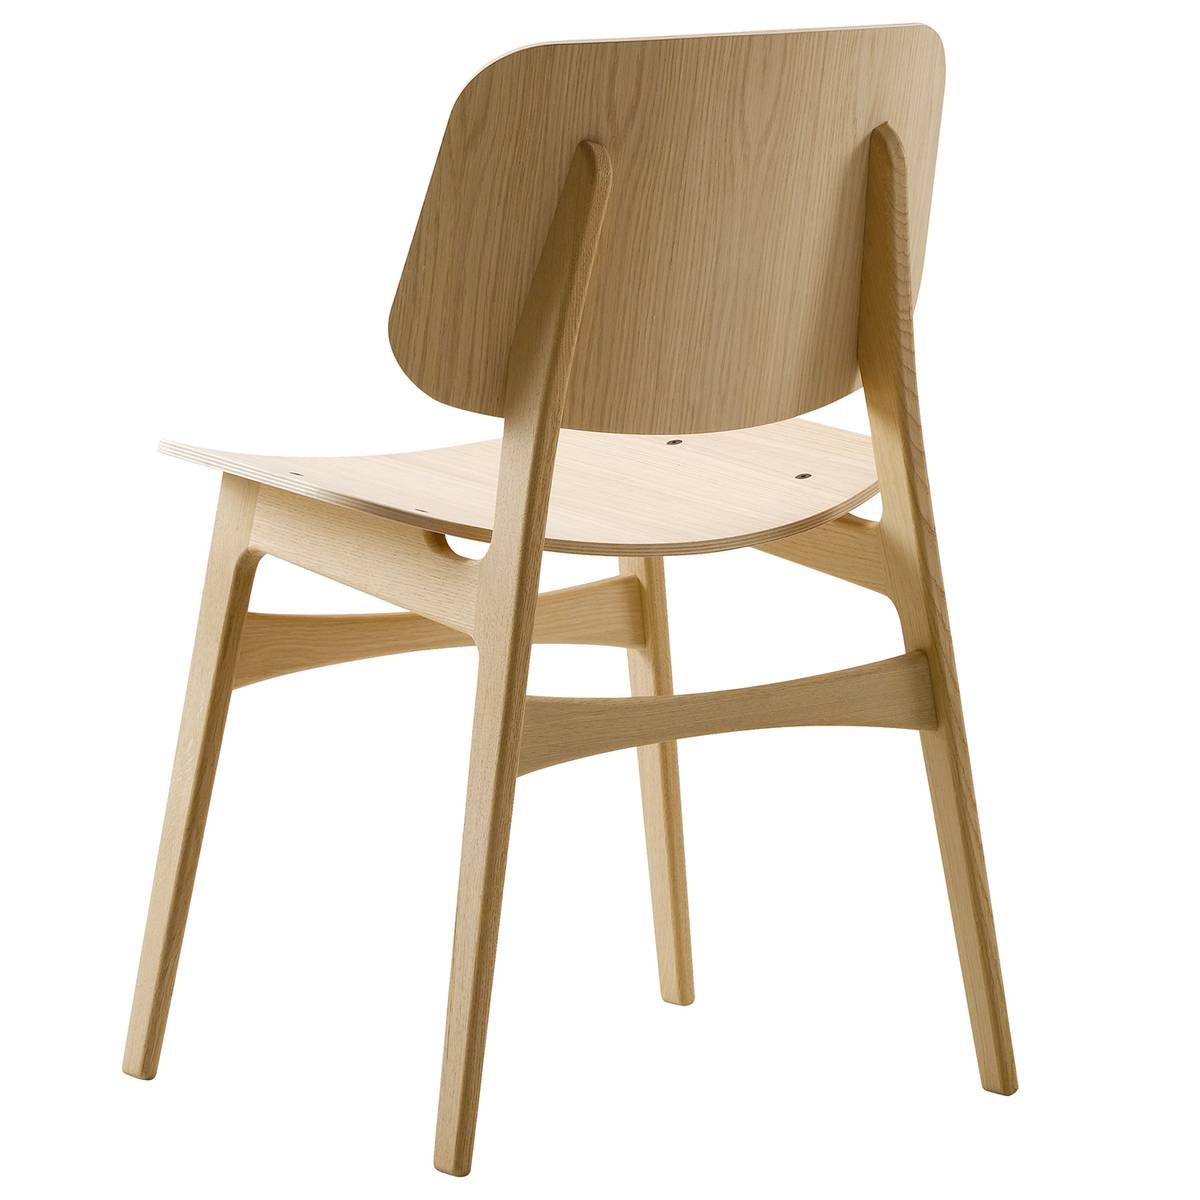 Fredericia S�borg tuoli 3050, puurunko, lakattu tammi